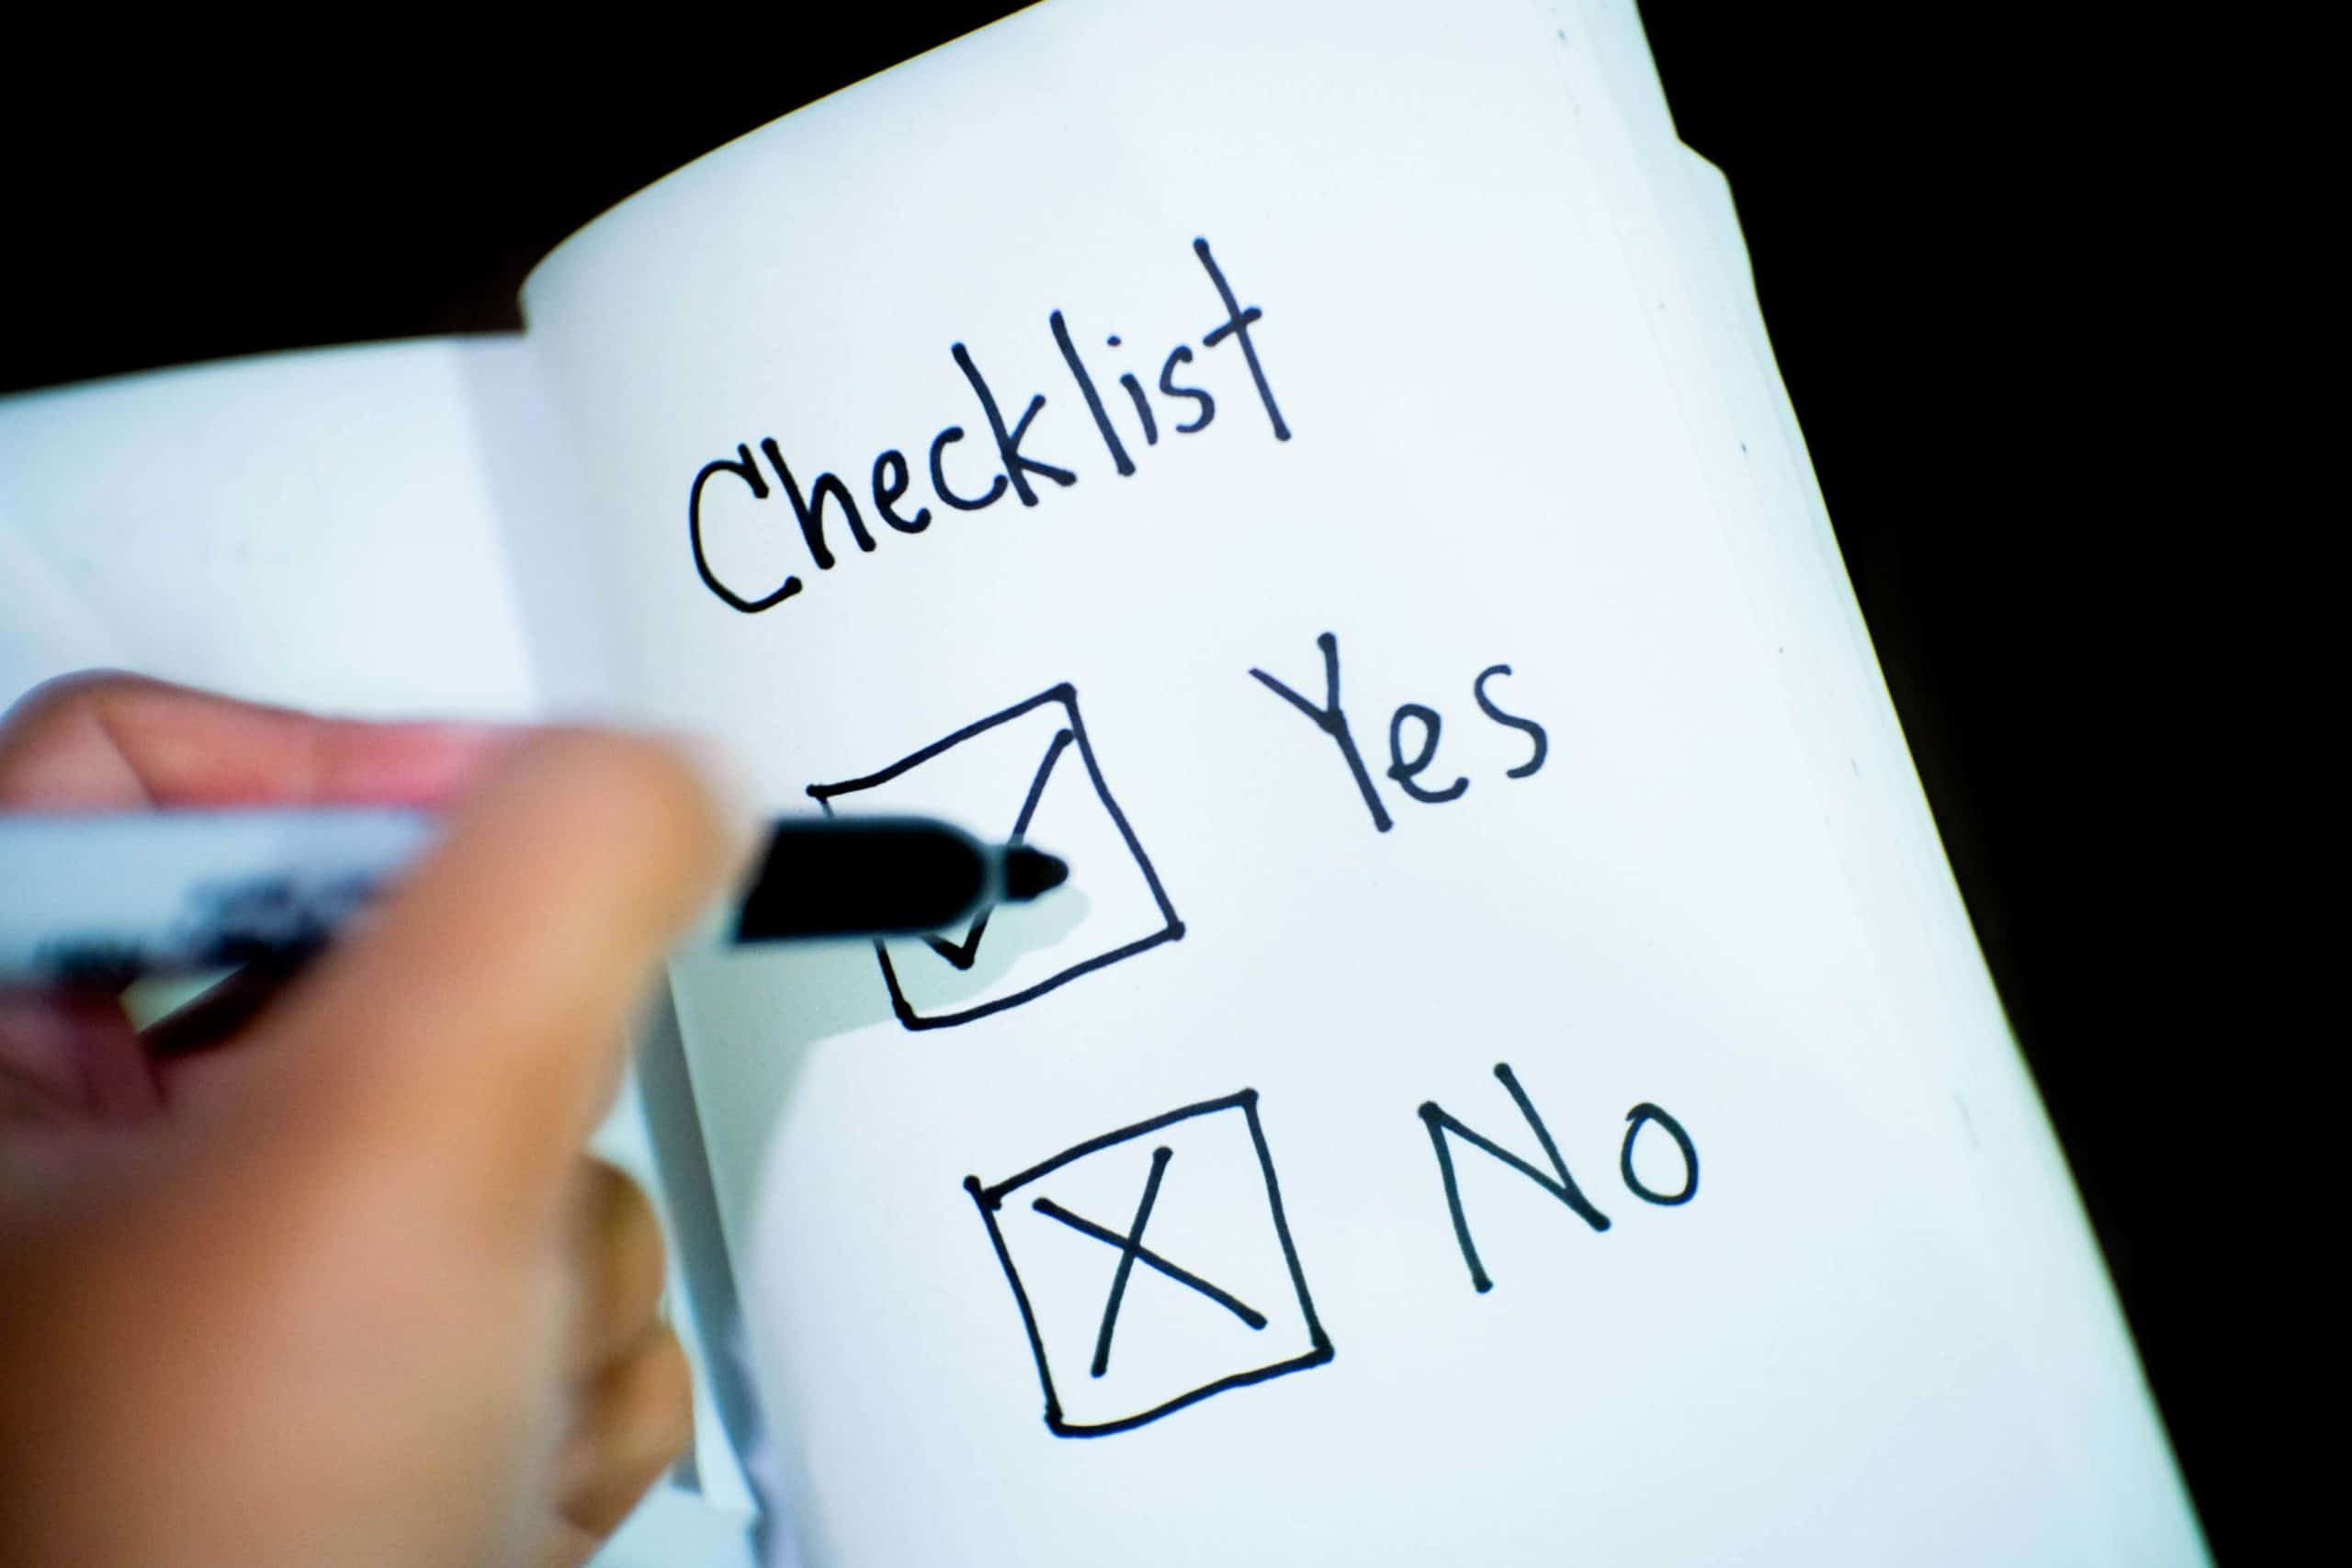 Checklists Prospero Accounting Business Bitesize Report Checklist Success